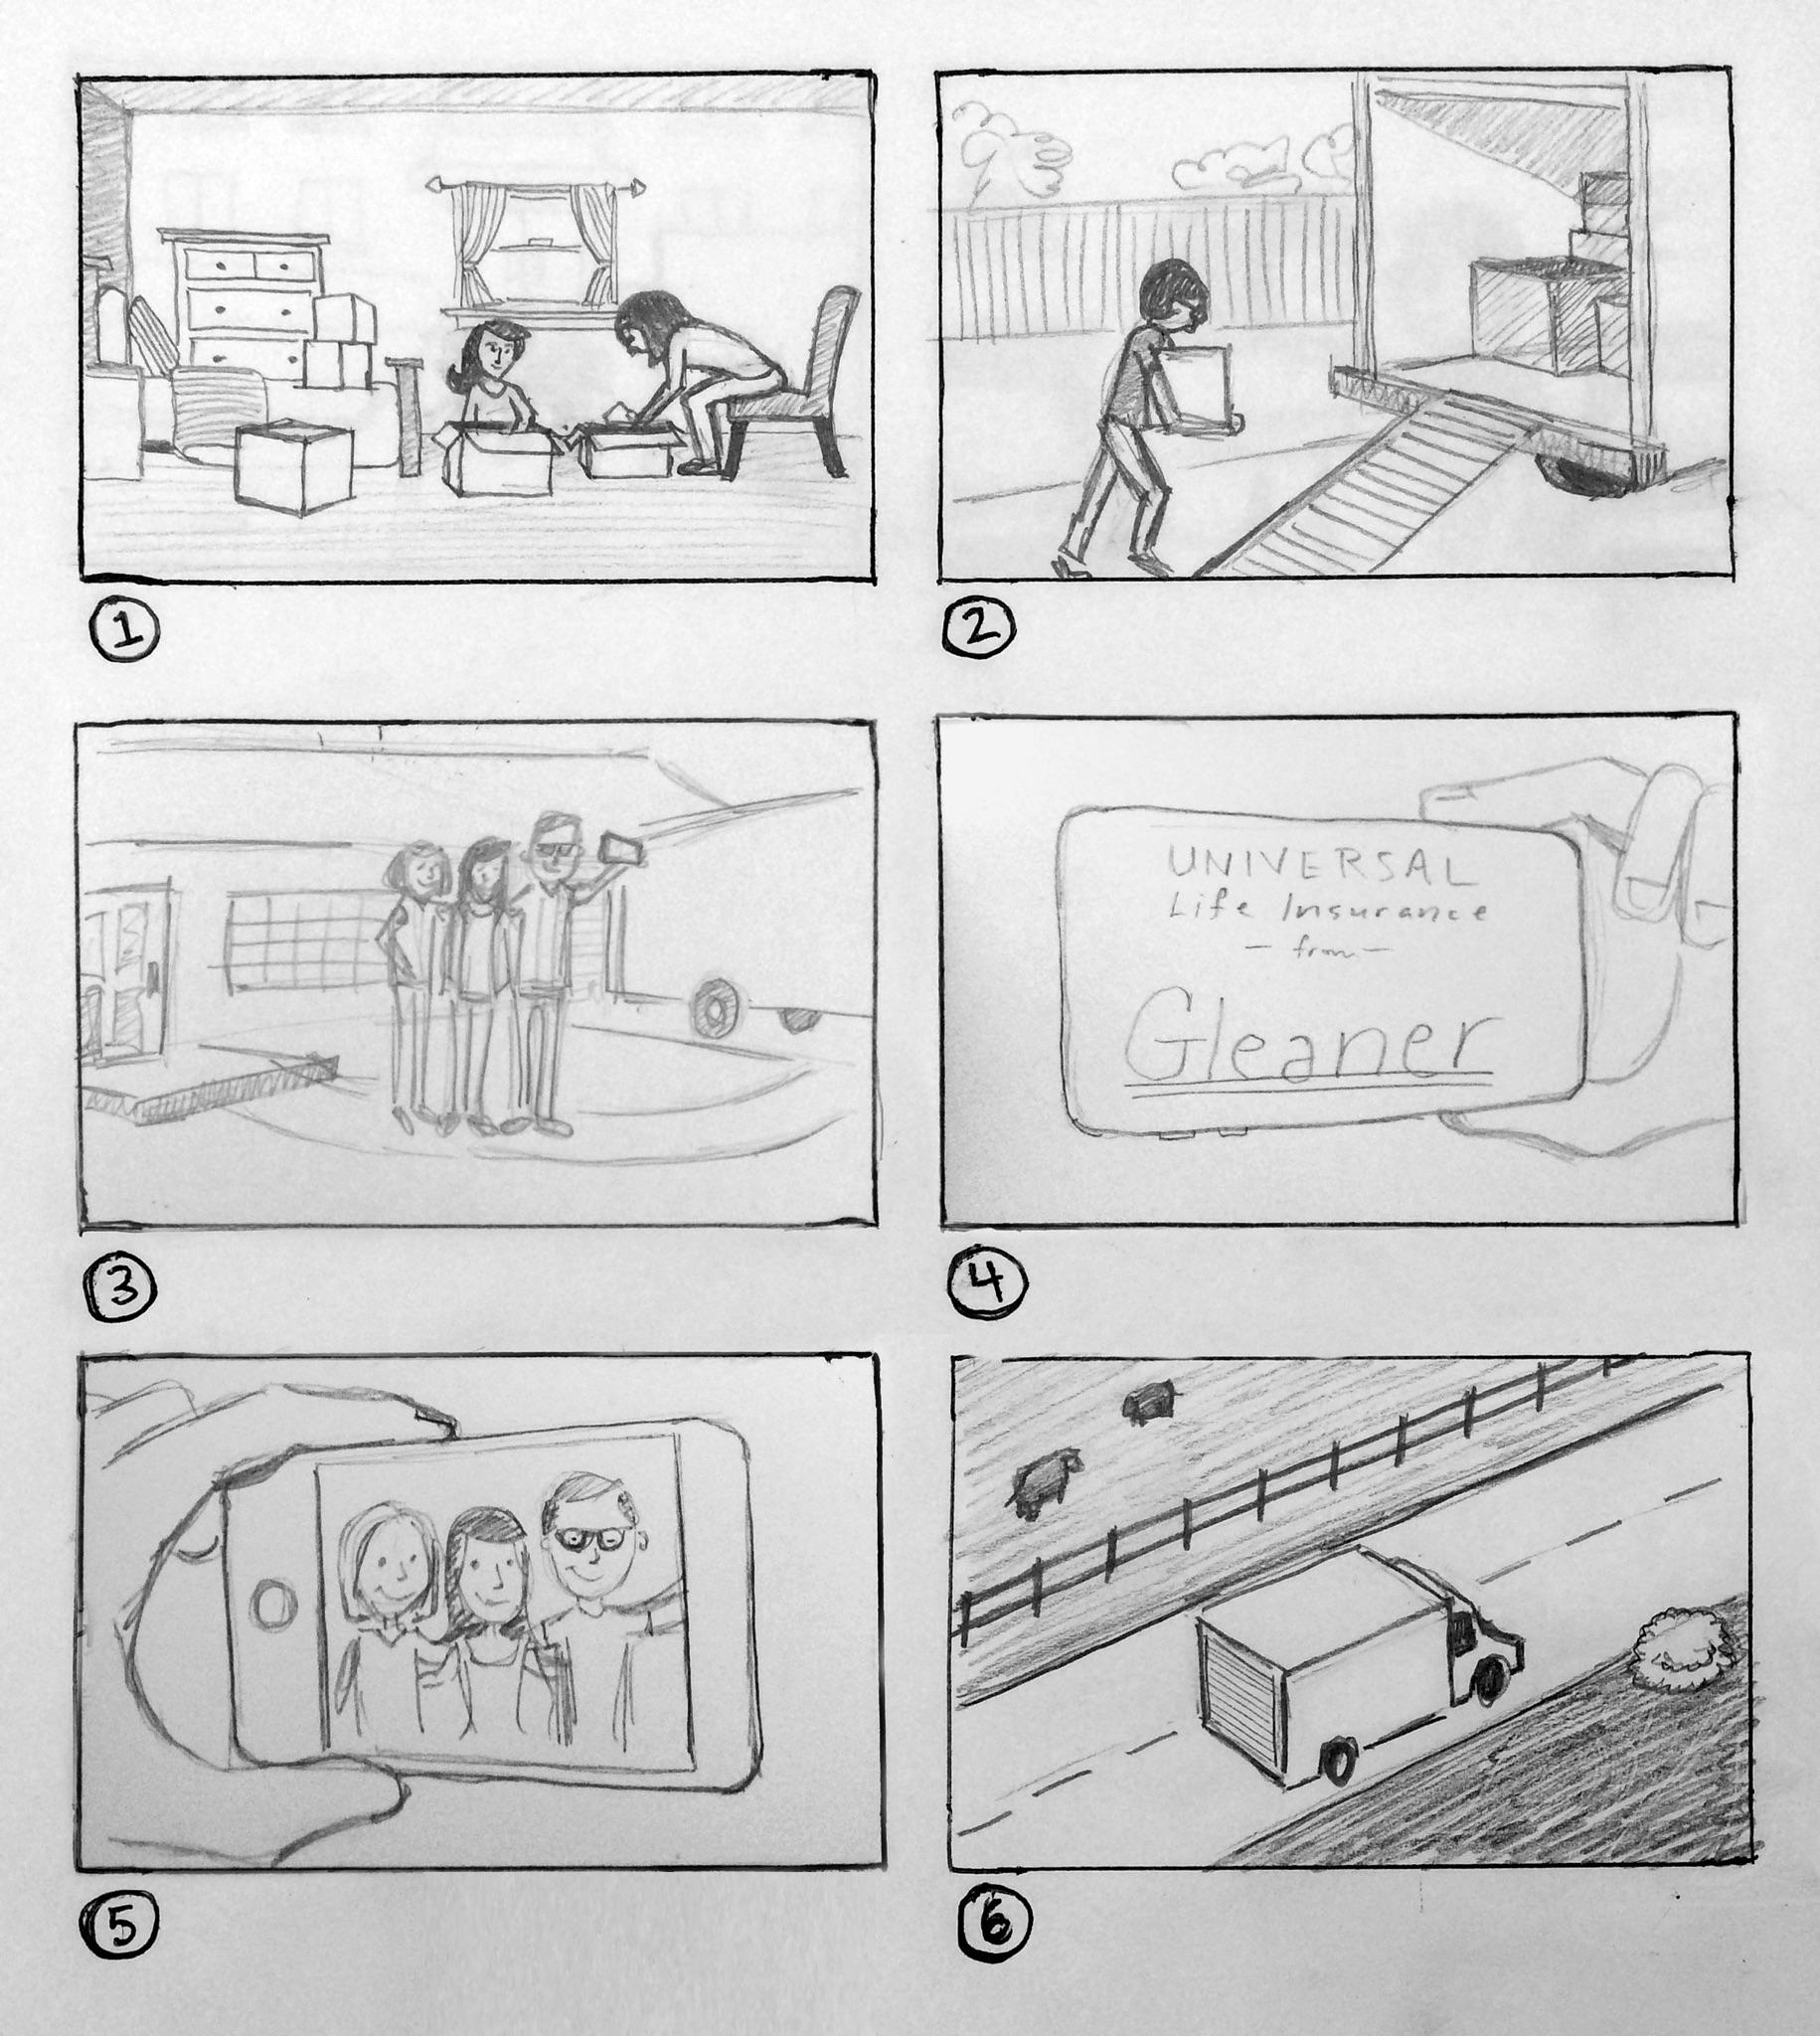 Gleaner_Univ_Storyboard-1.jpg.jpeg